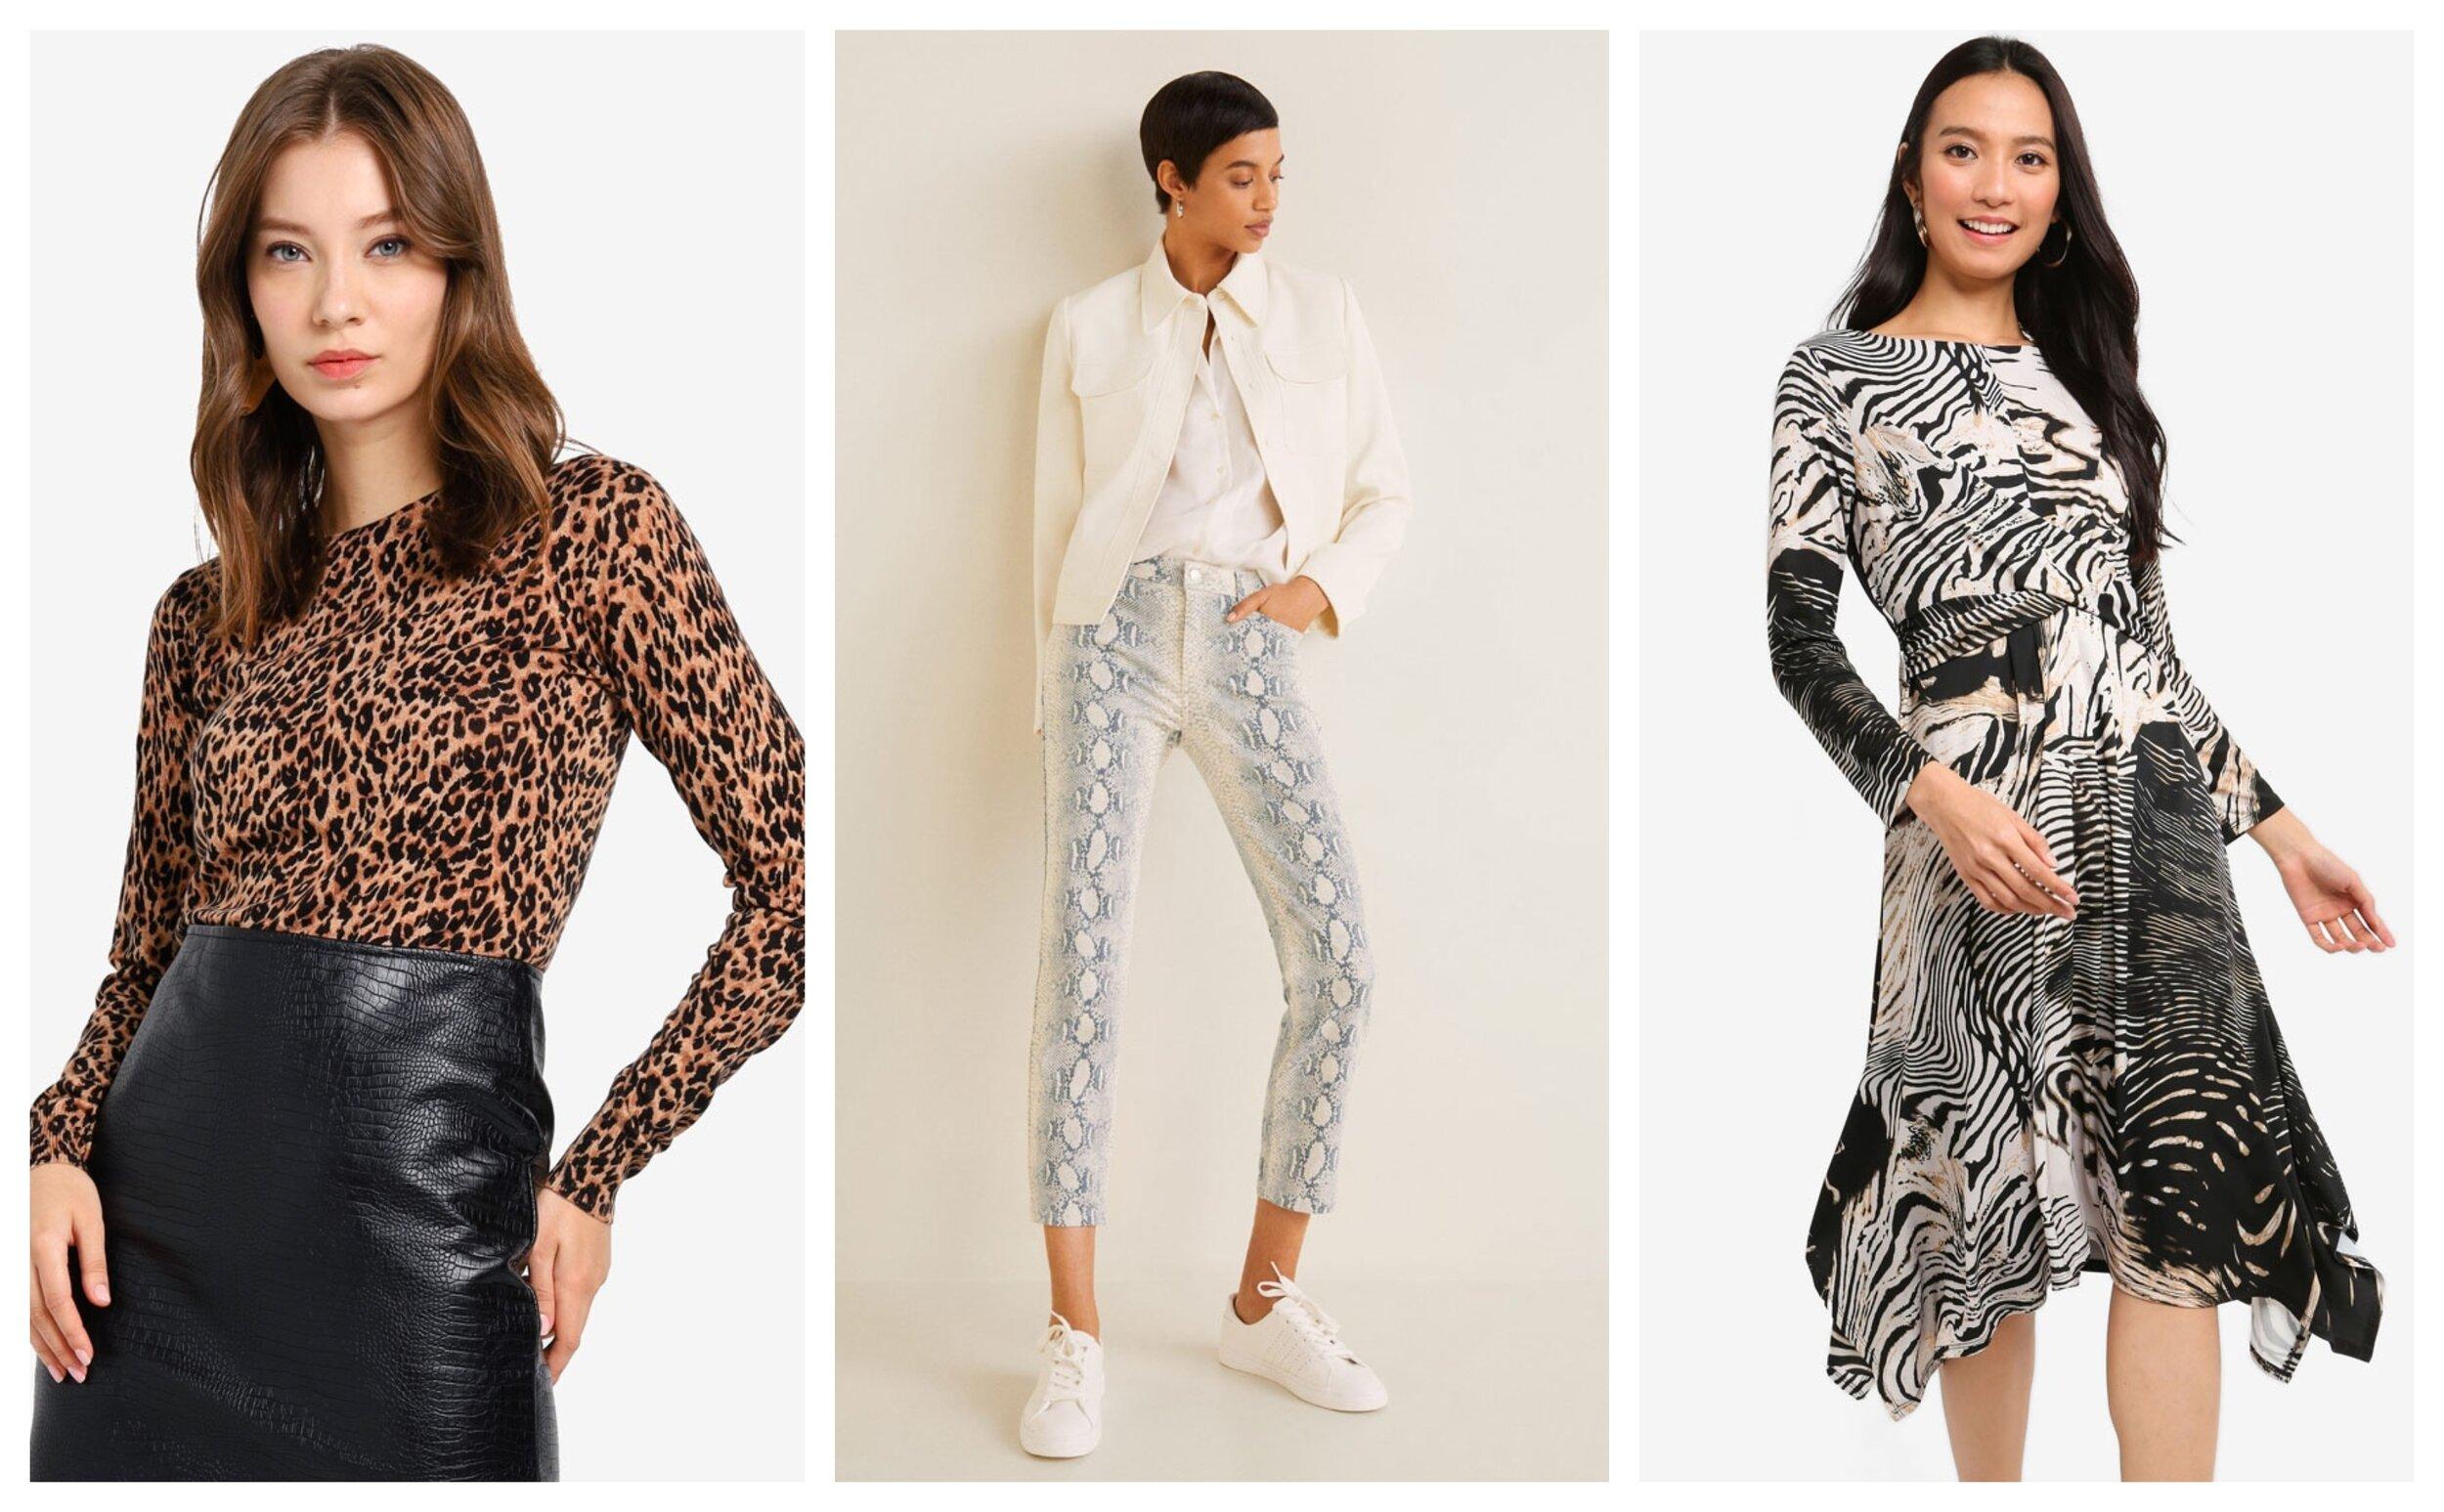 Warehouse Animal Print Crew Jumper   ,    Mango Animal Print Jeans   ,    Wallis Petite Stone Animal Print Twist Front Dress